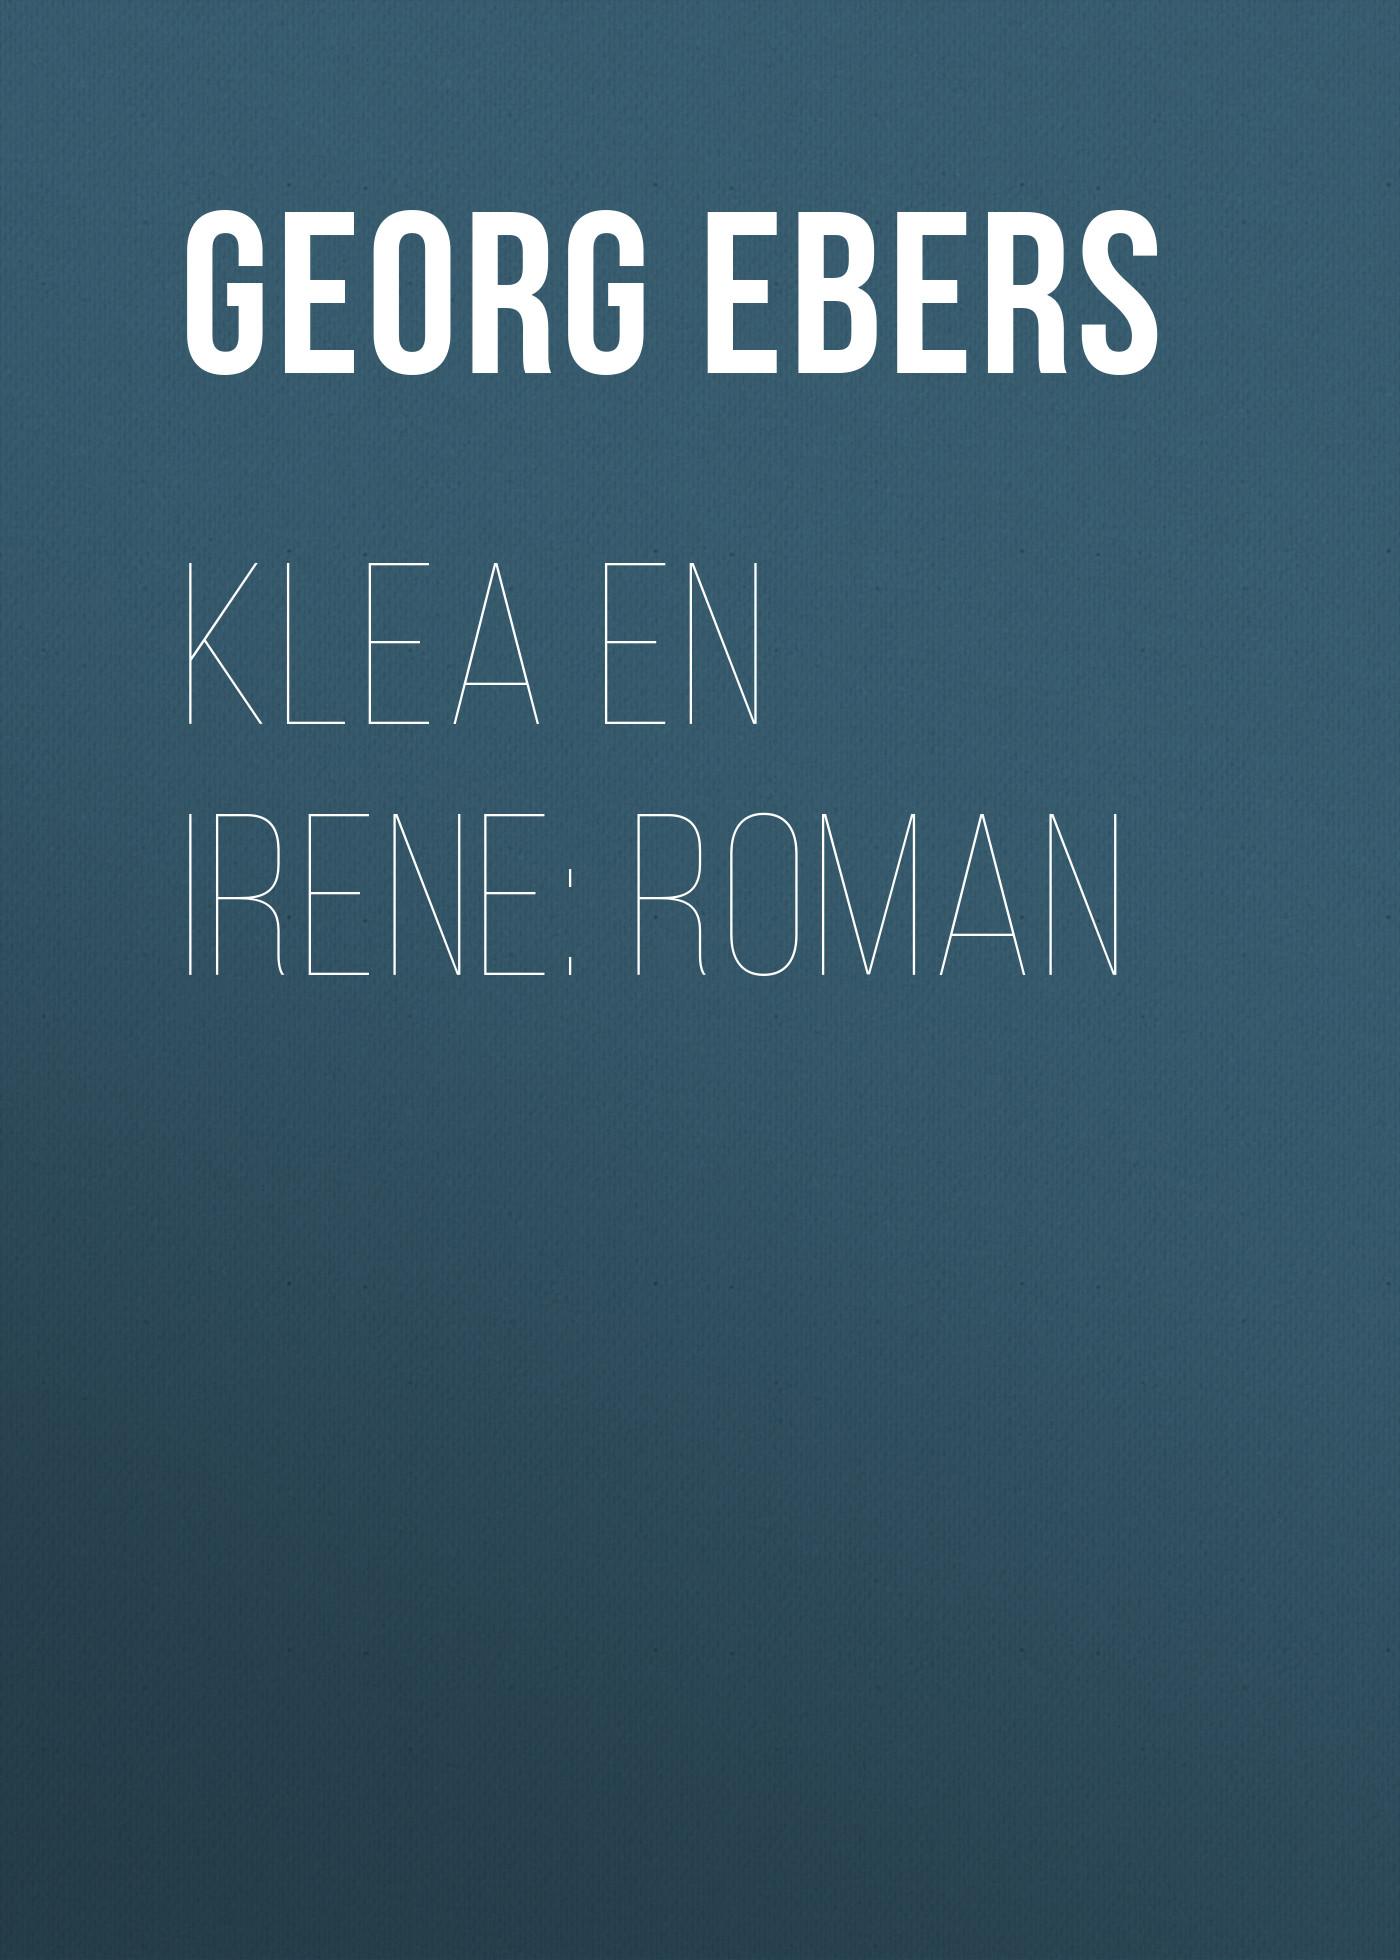 Georg Ebers Klea en Irene: roman бирюса 127 klea